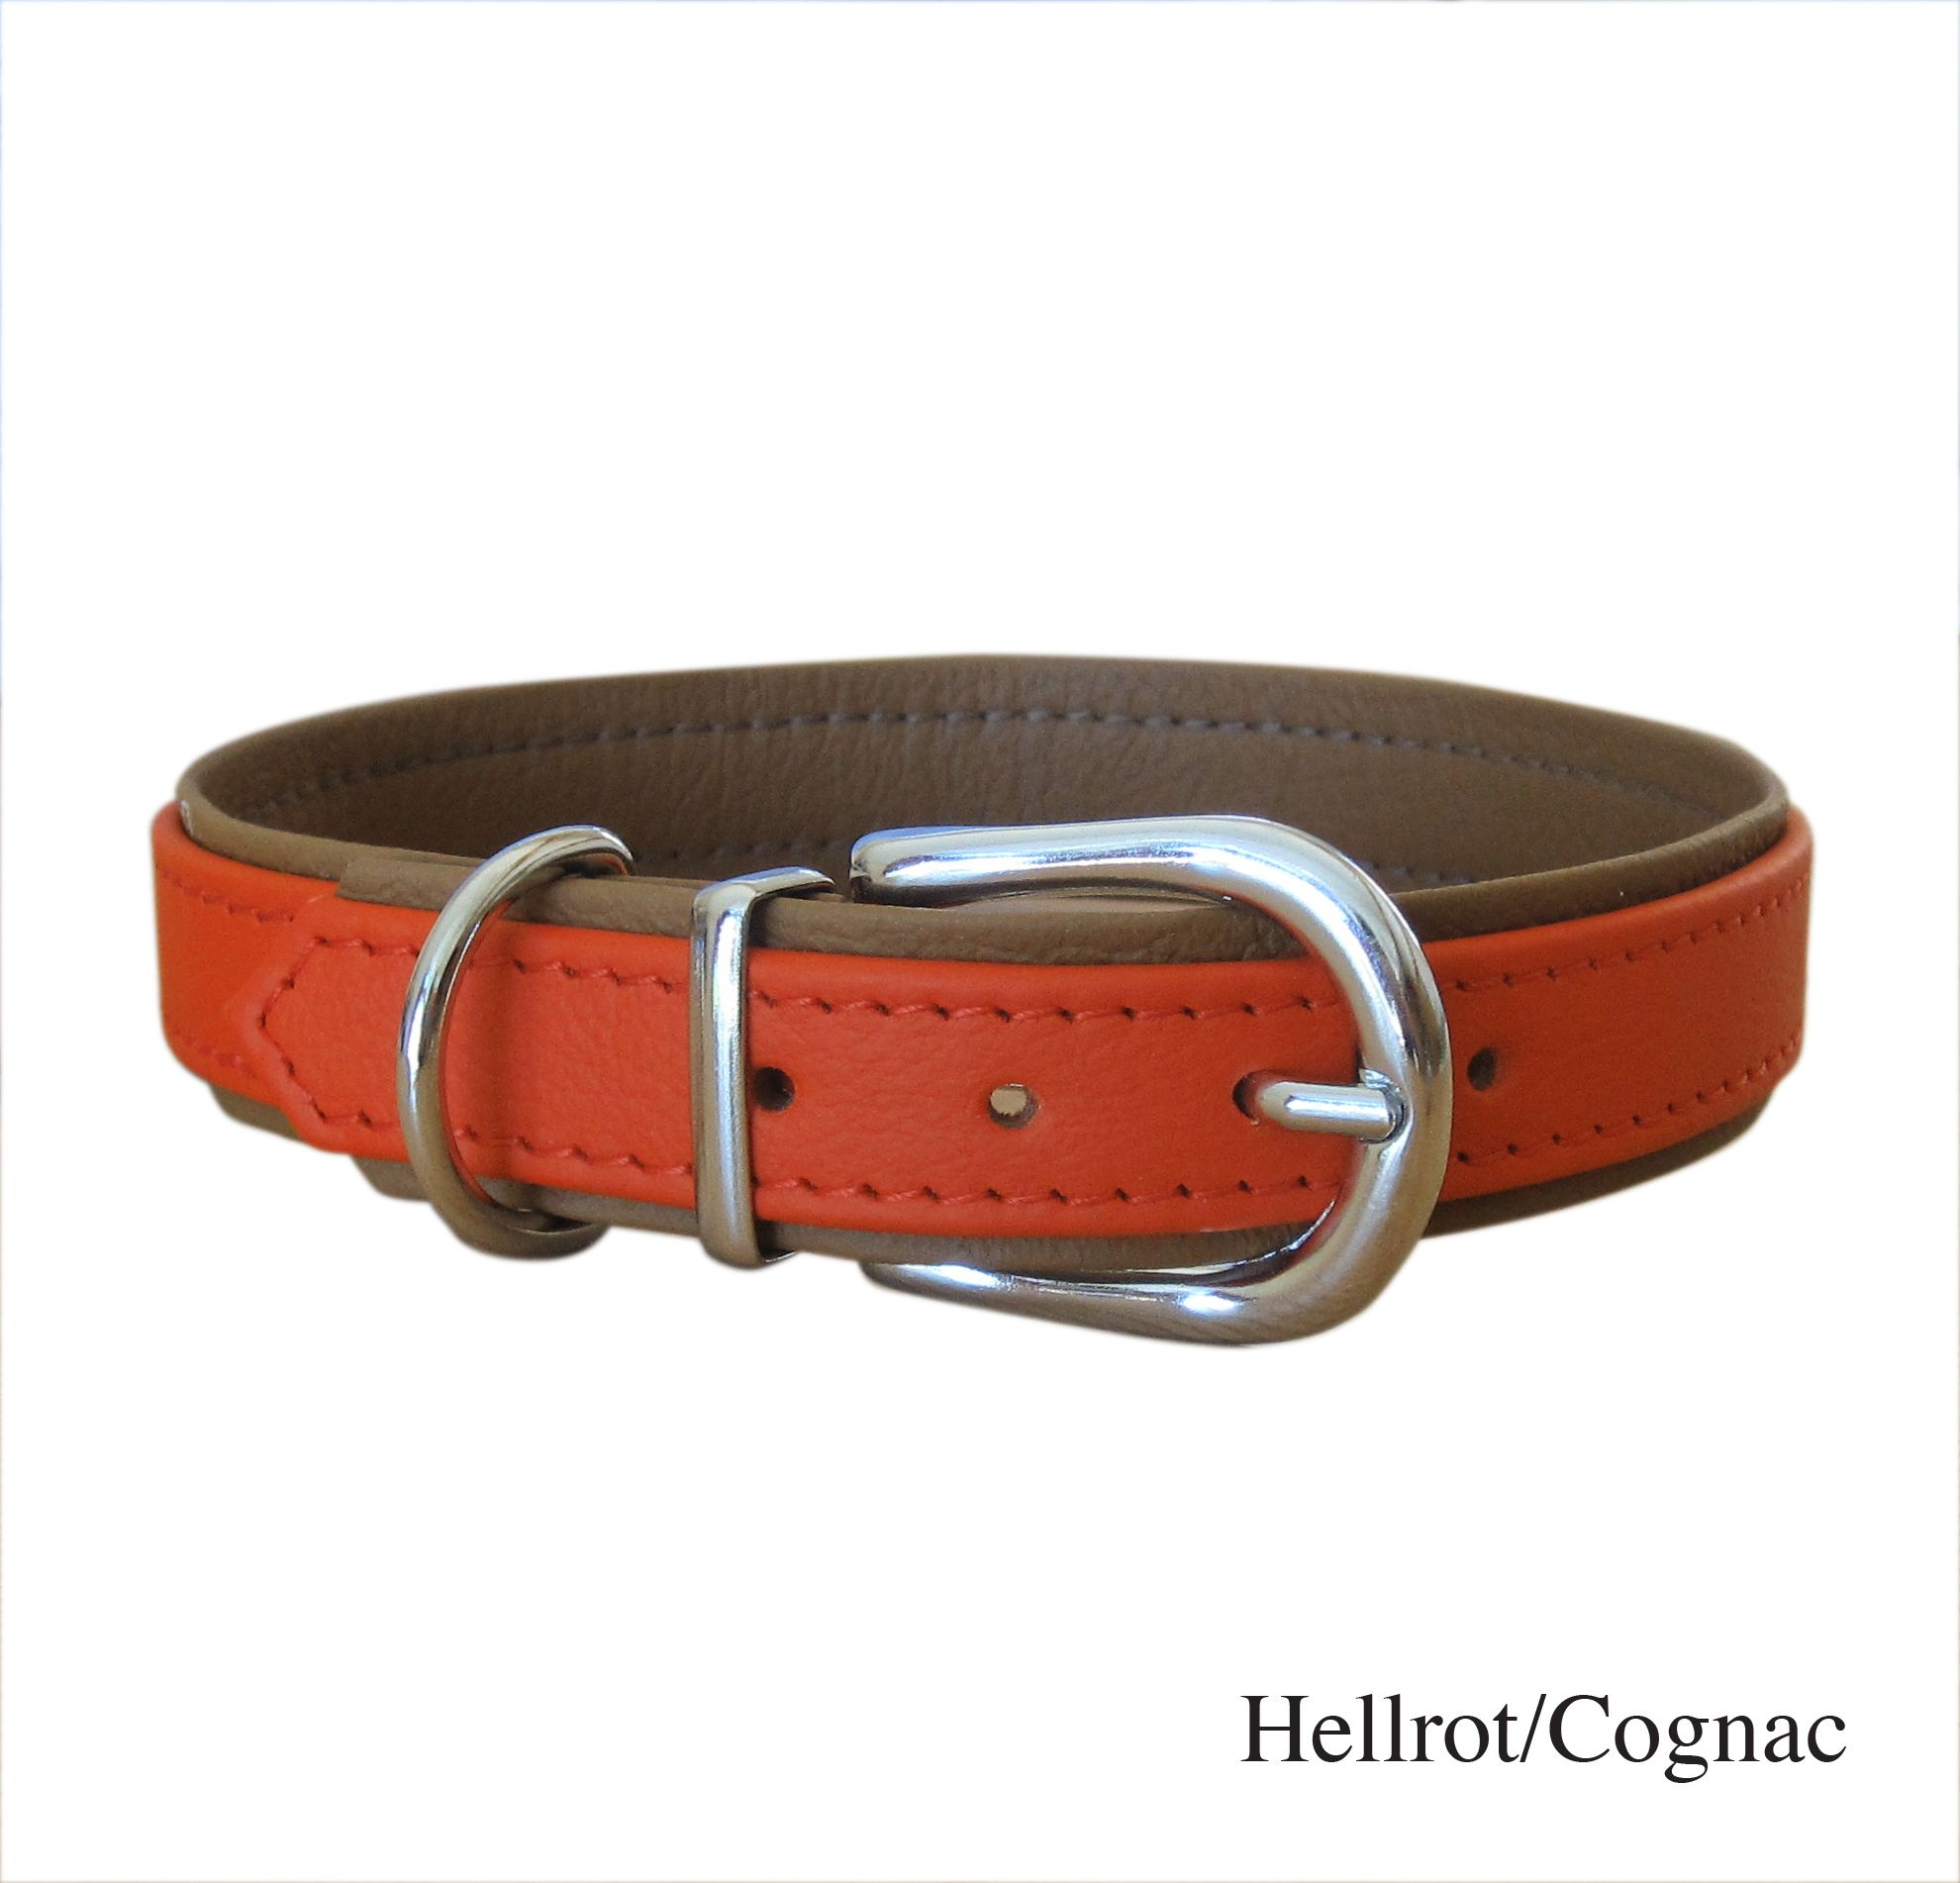 Halsband Basic, hellrot-cognac http://www.hundeleben-exklusiv.de/products/SCHOeNER-GASSI/Halsbaender-Leinen/Leder/Hundehalsband-Basic-in-vielen-Farbkombis.html